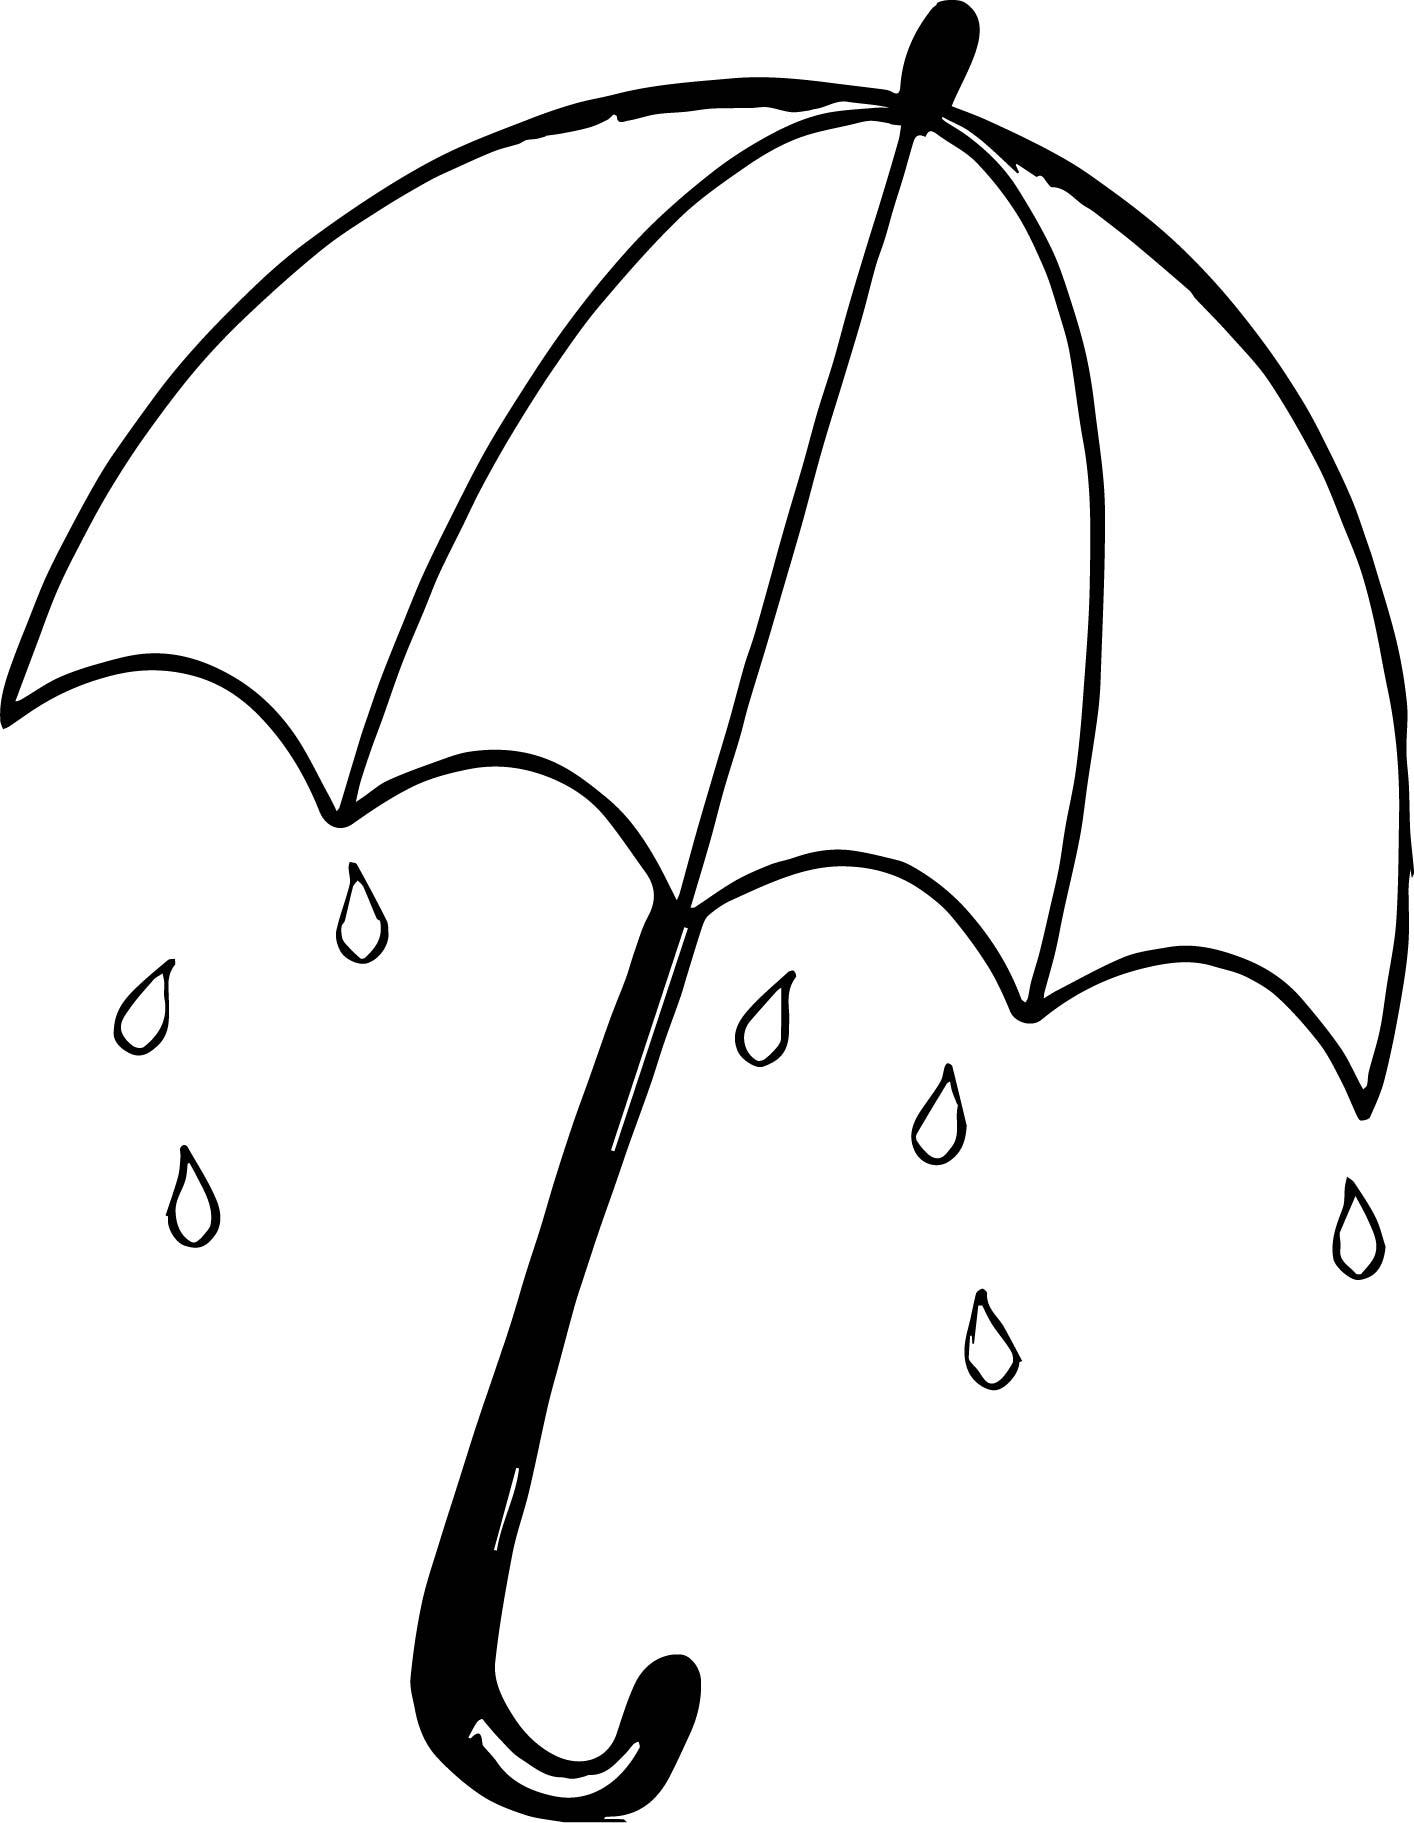 April Shower Umbrella Coloring Page Wecoloringpage